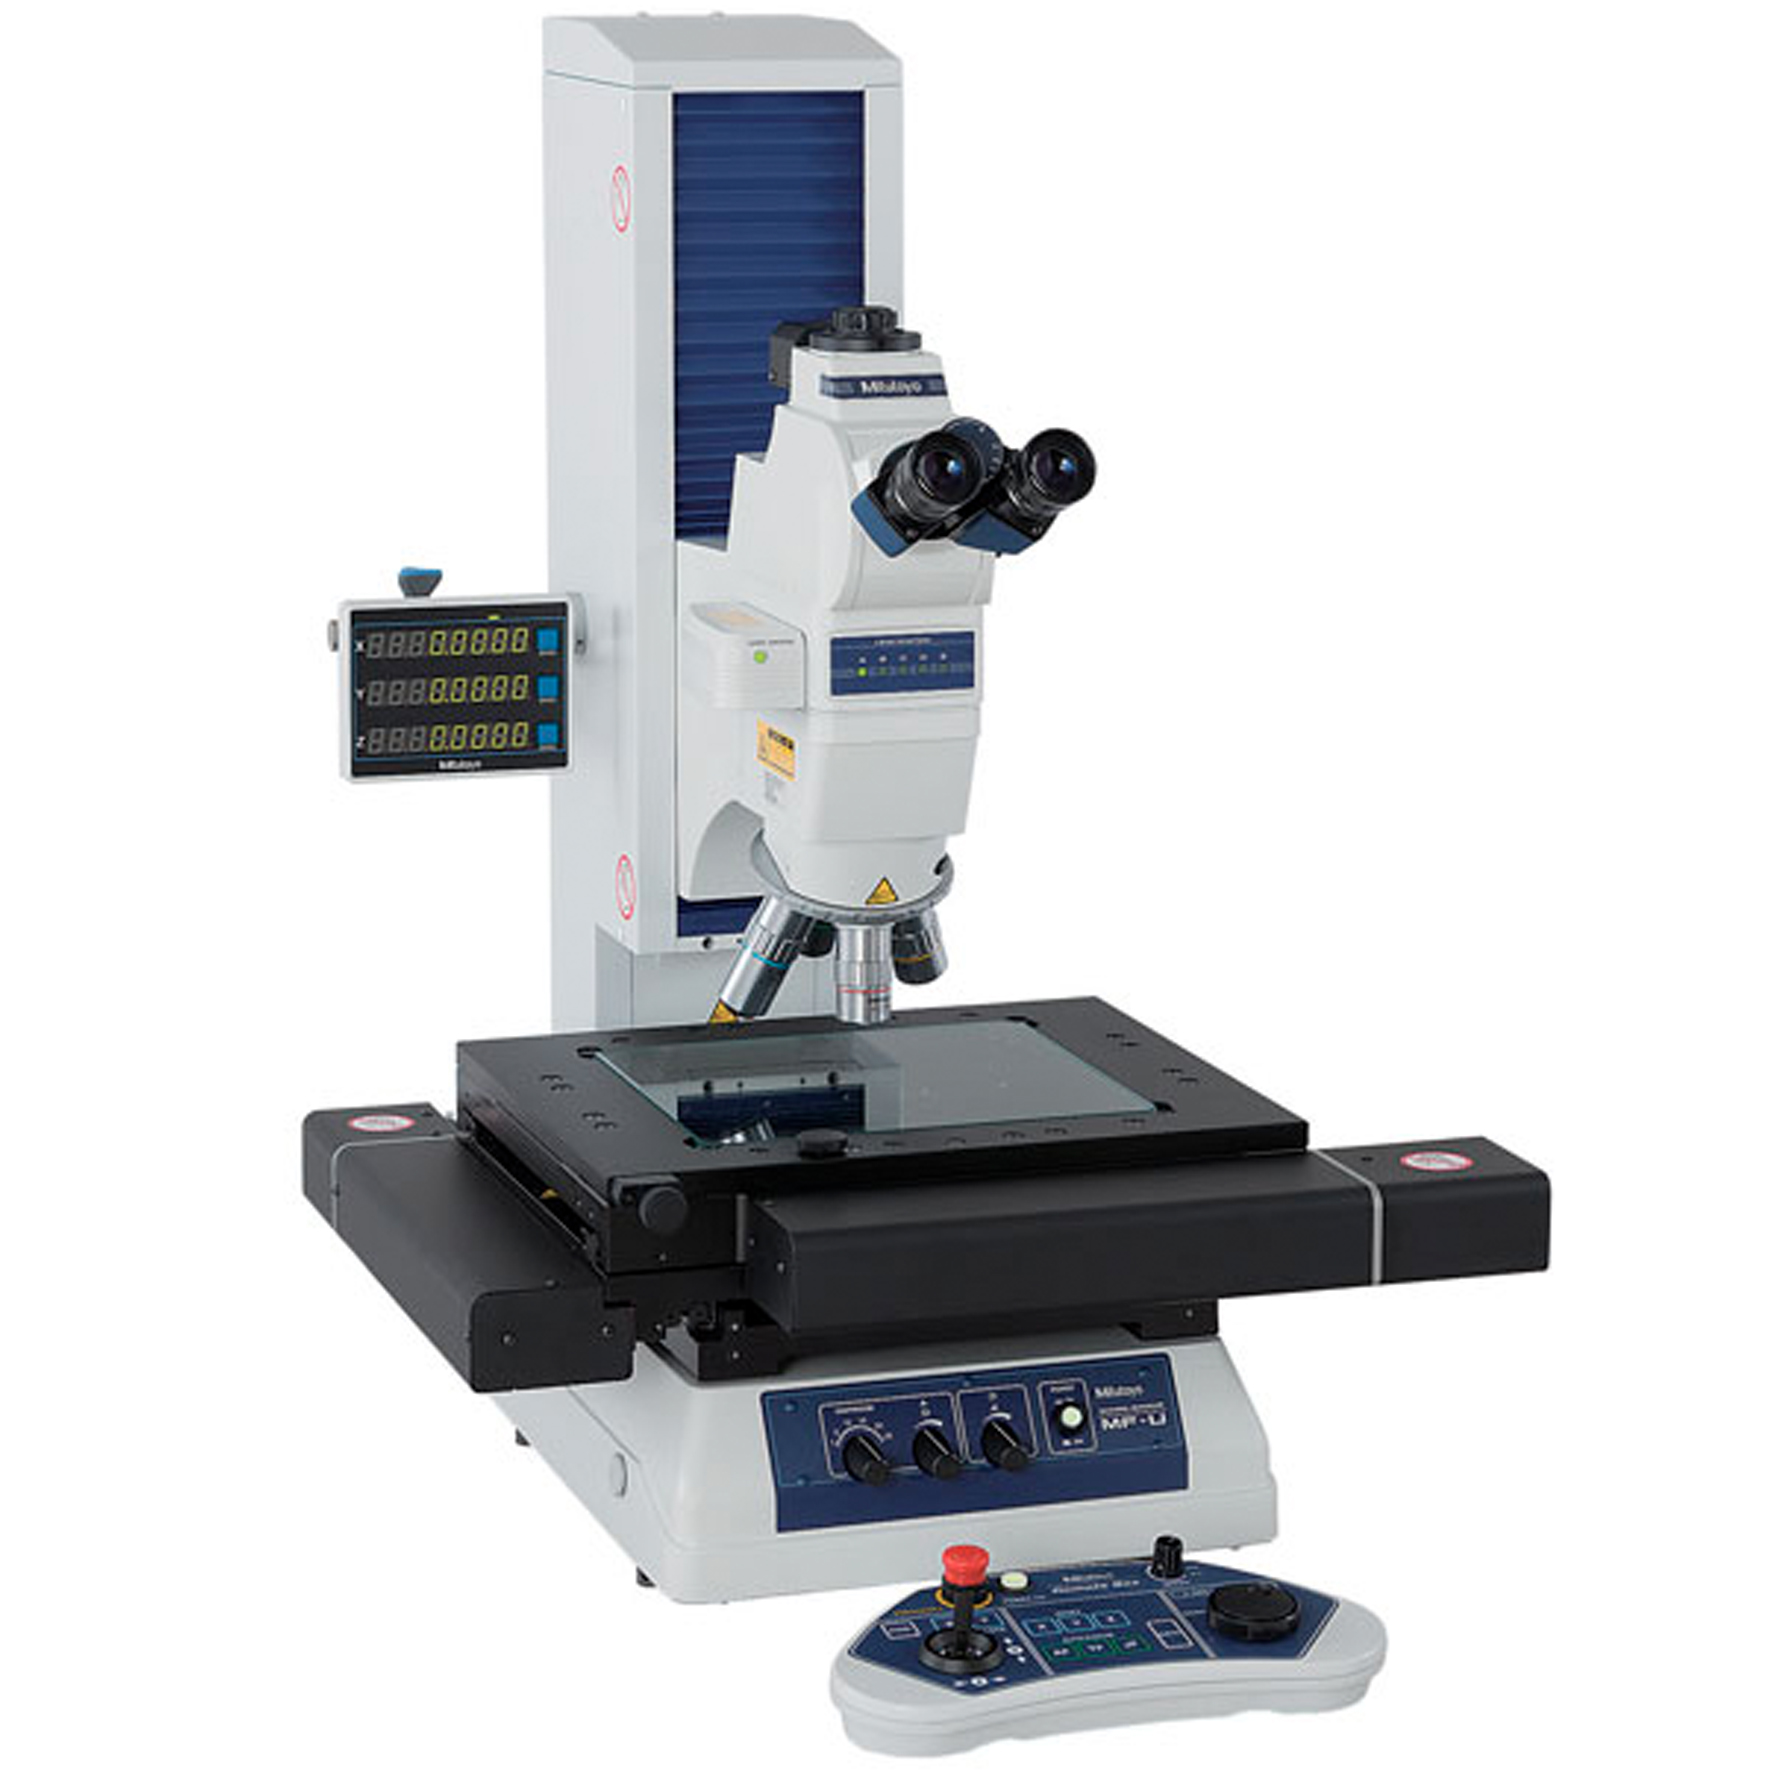 Microscopio de medición motorizado MF-U (Tipo Motorizado) (MF-UG2017D, MF-UG3017